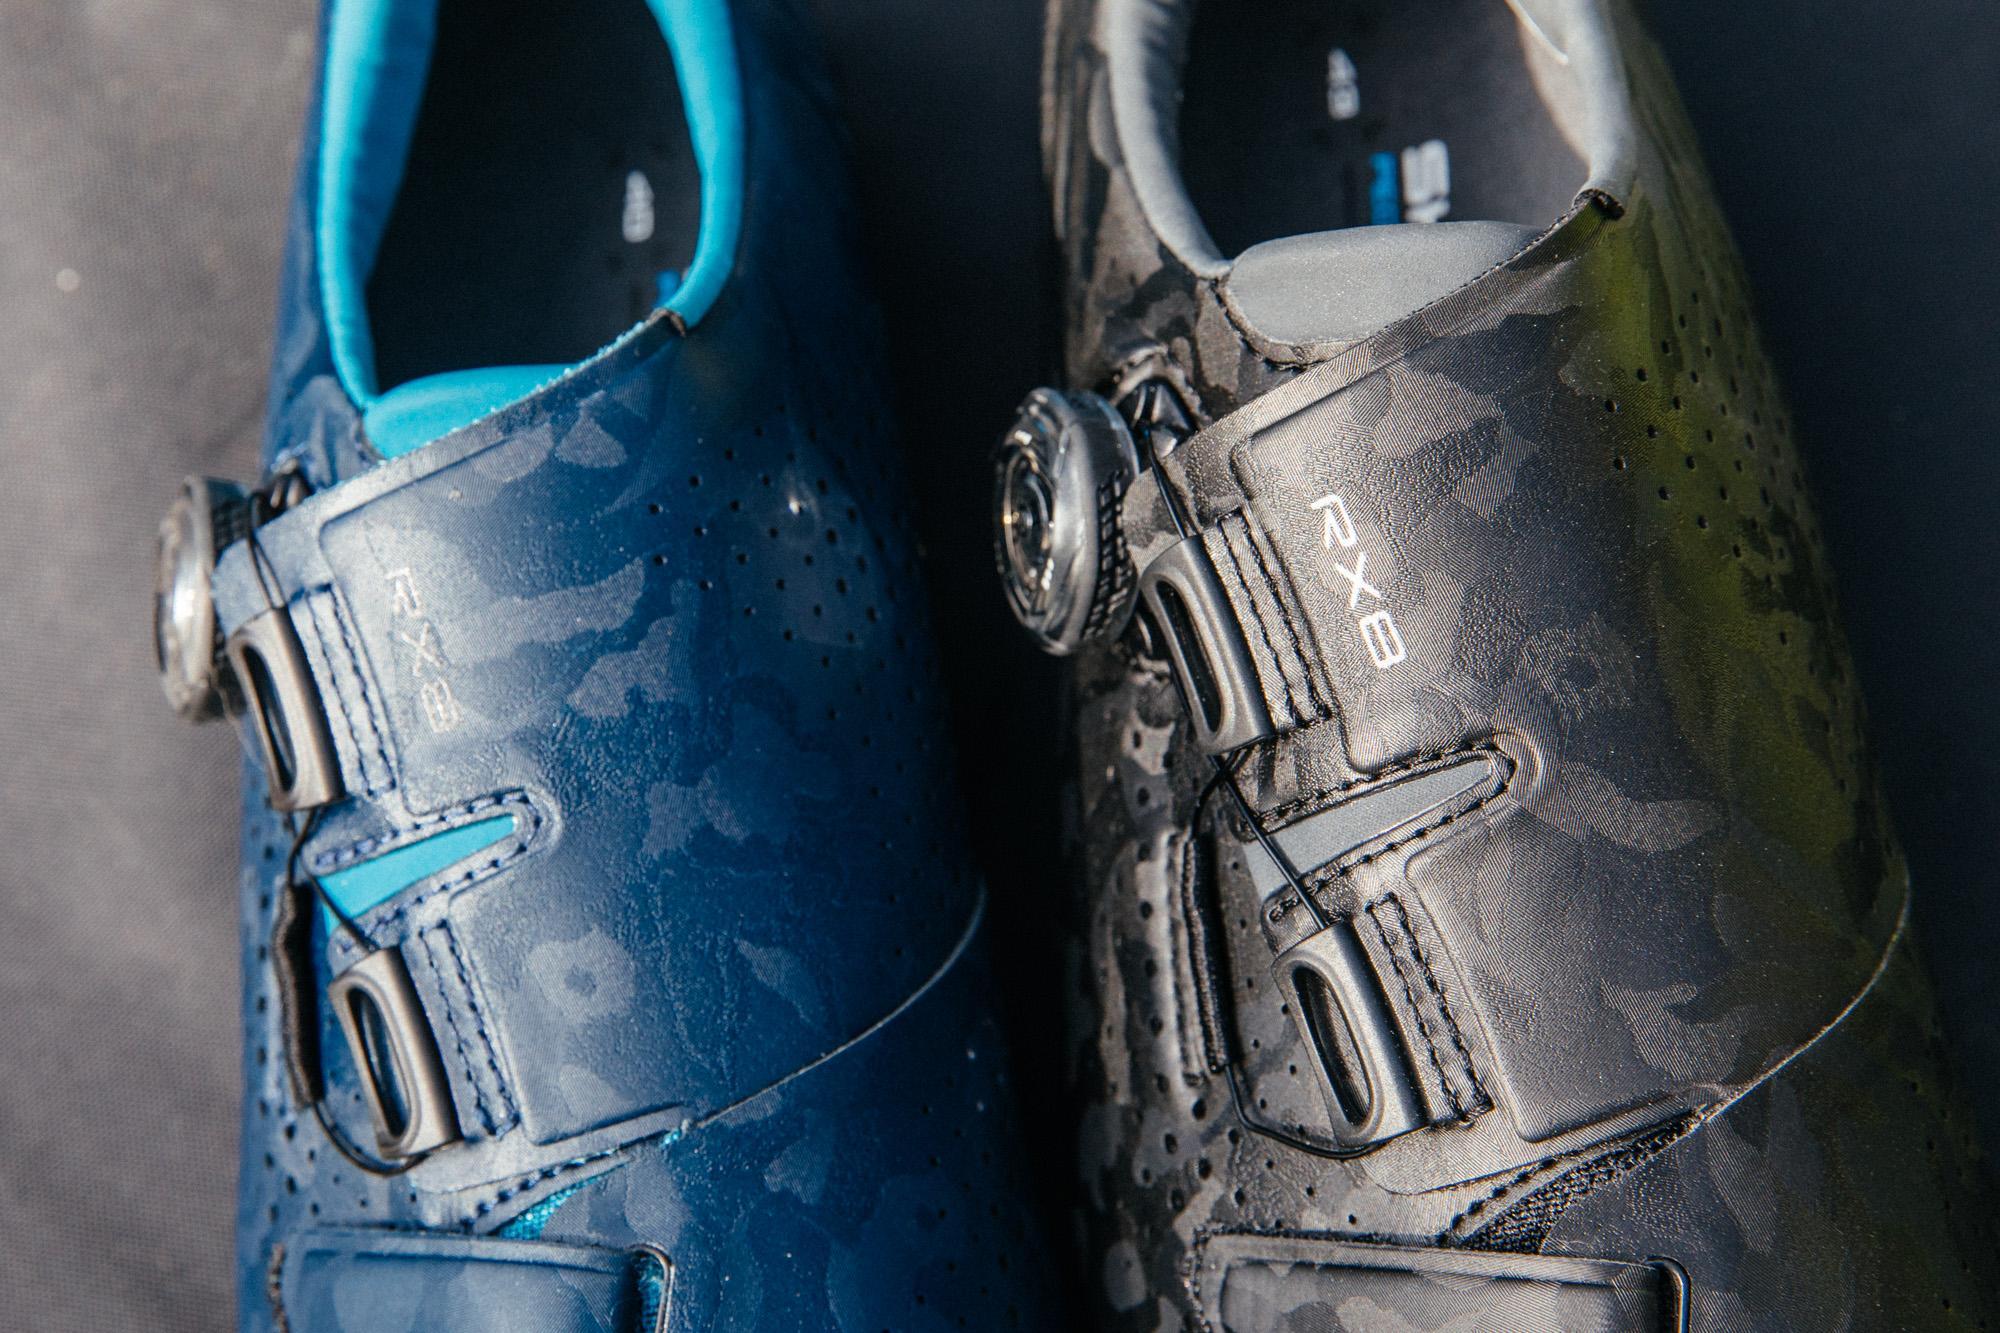 Shimano's 'gravel' shoes.